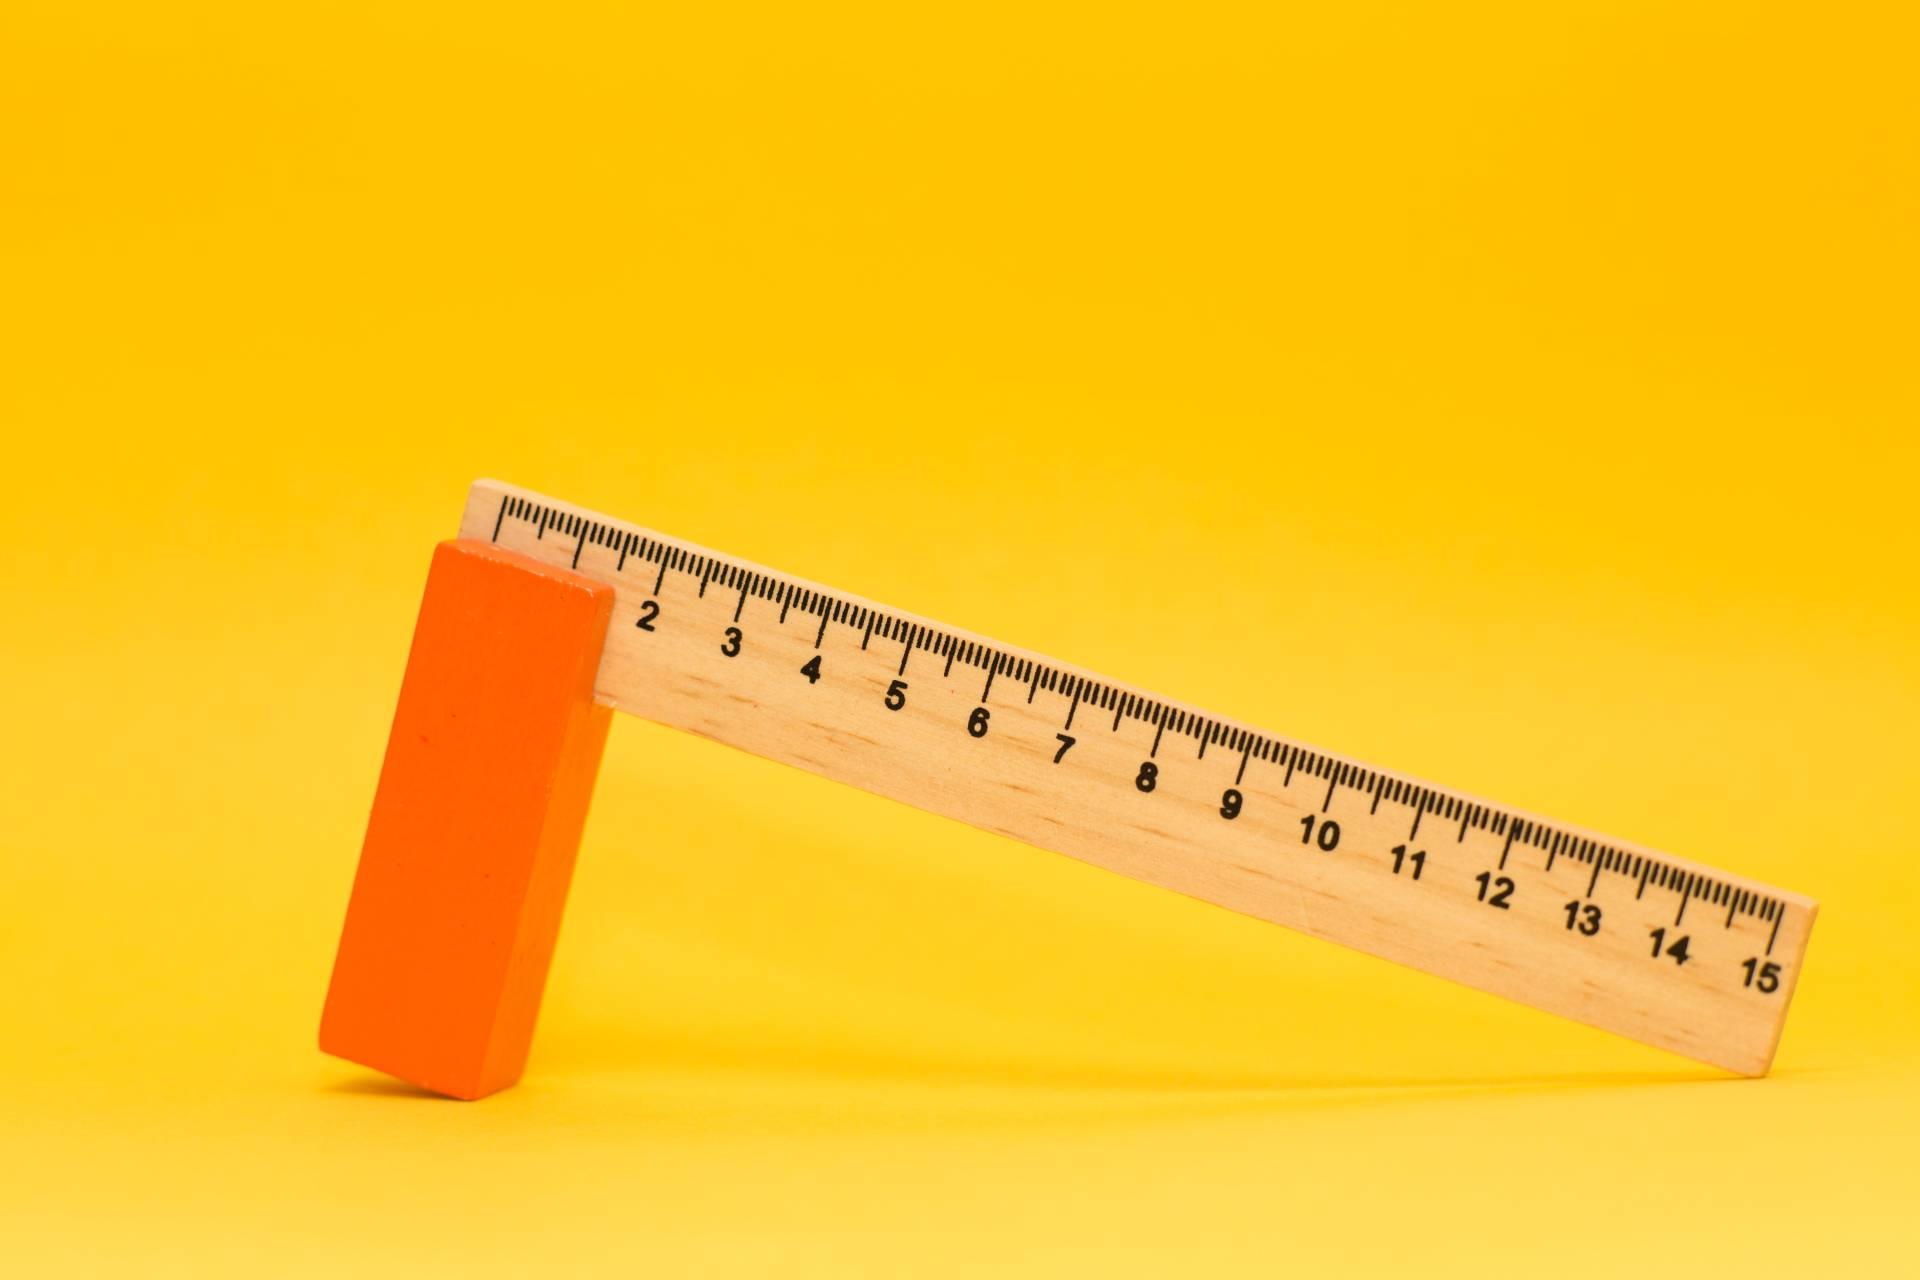 optimal social media image size